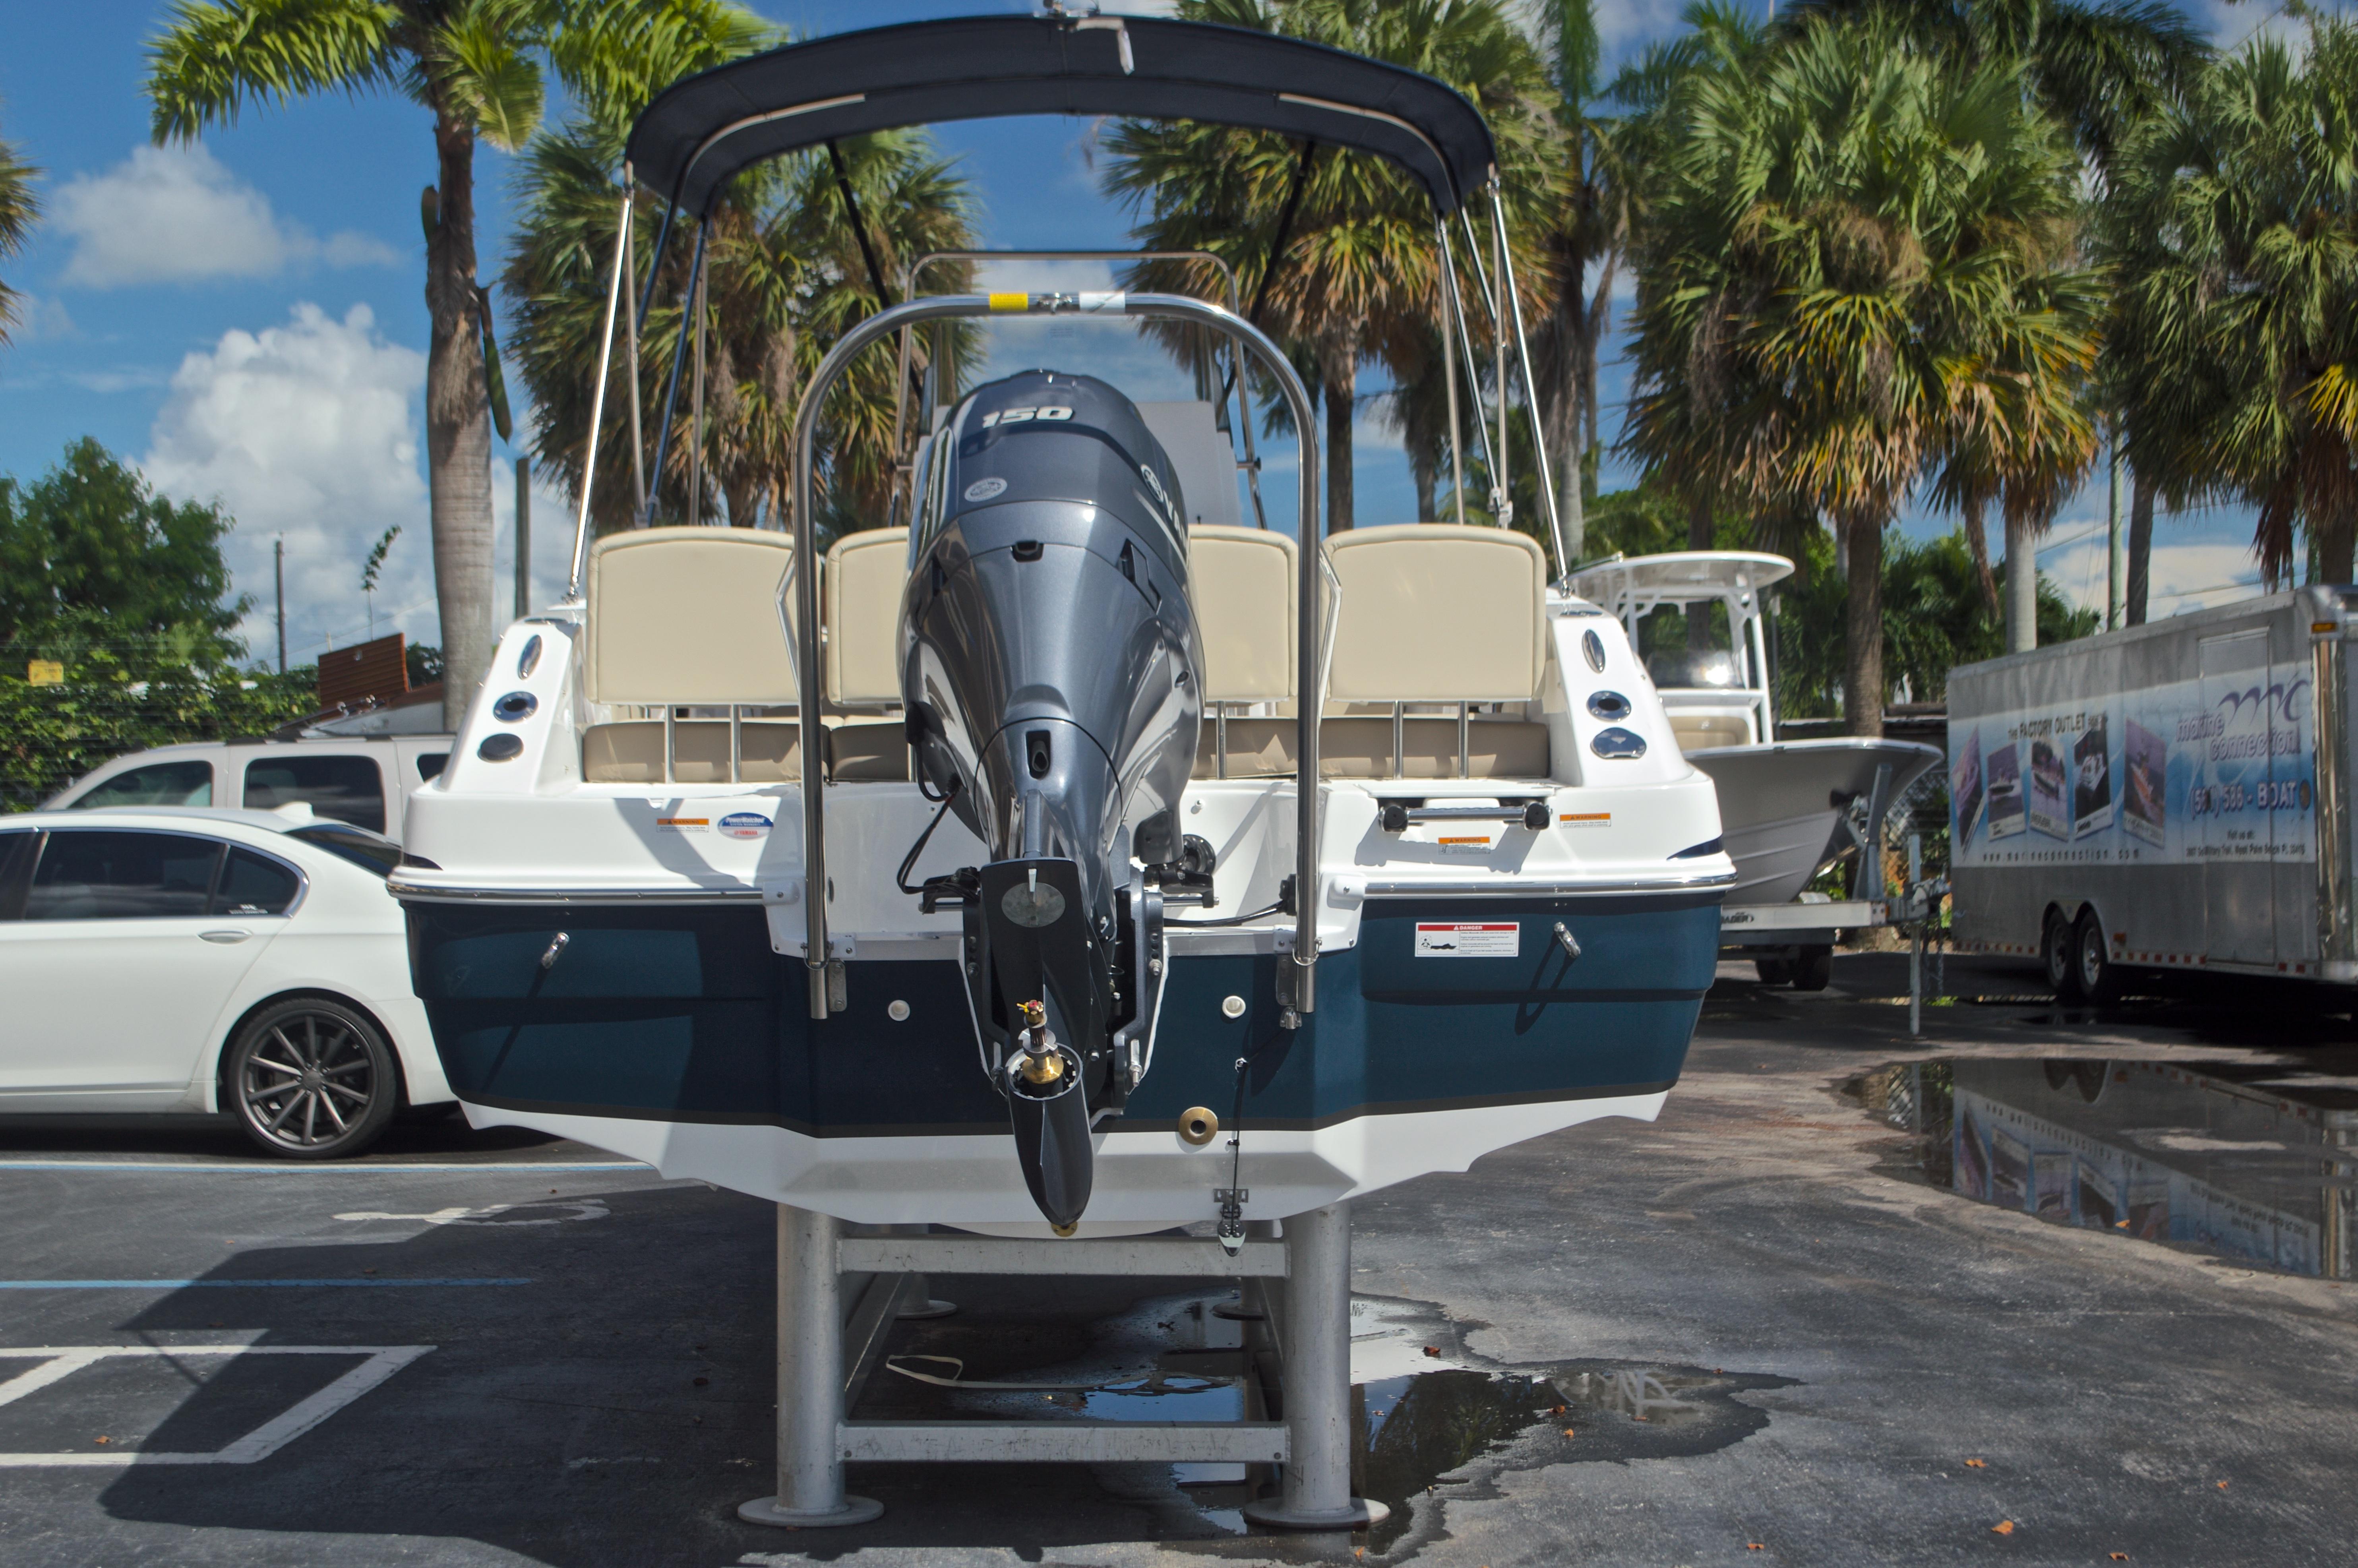 Thumbnail 6 for New 2017 Hurricane CC21 Center Console boat for sale in Vero Beach, FL